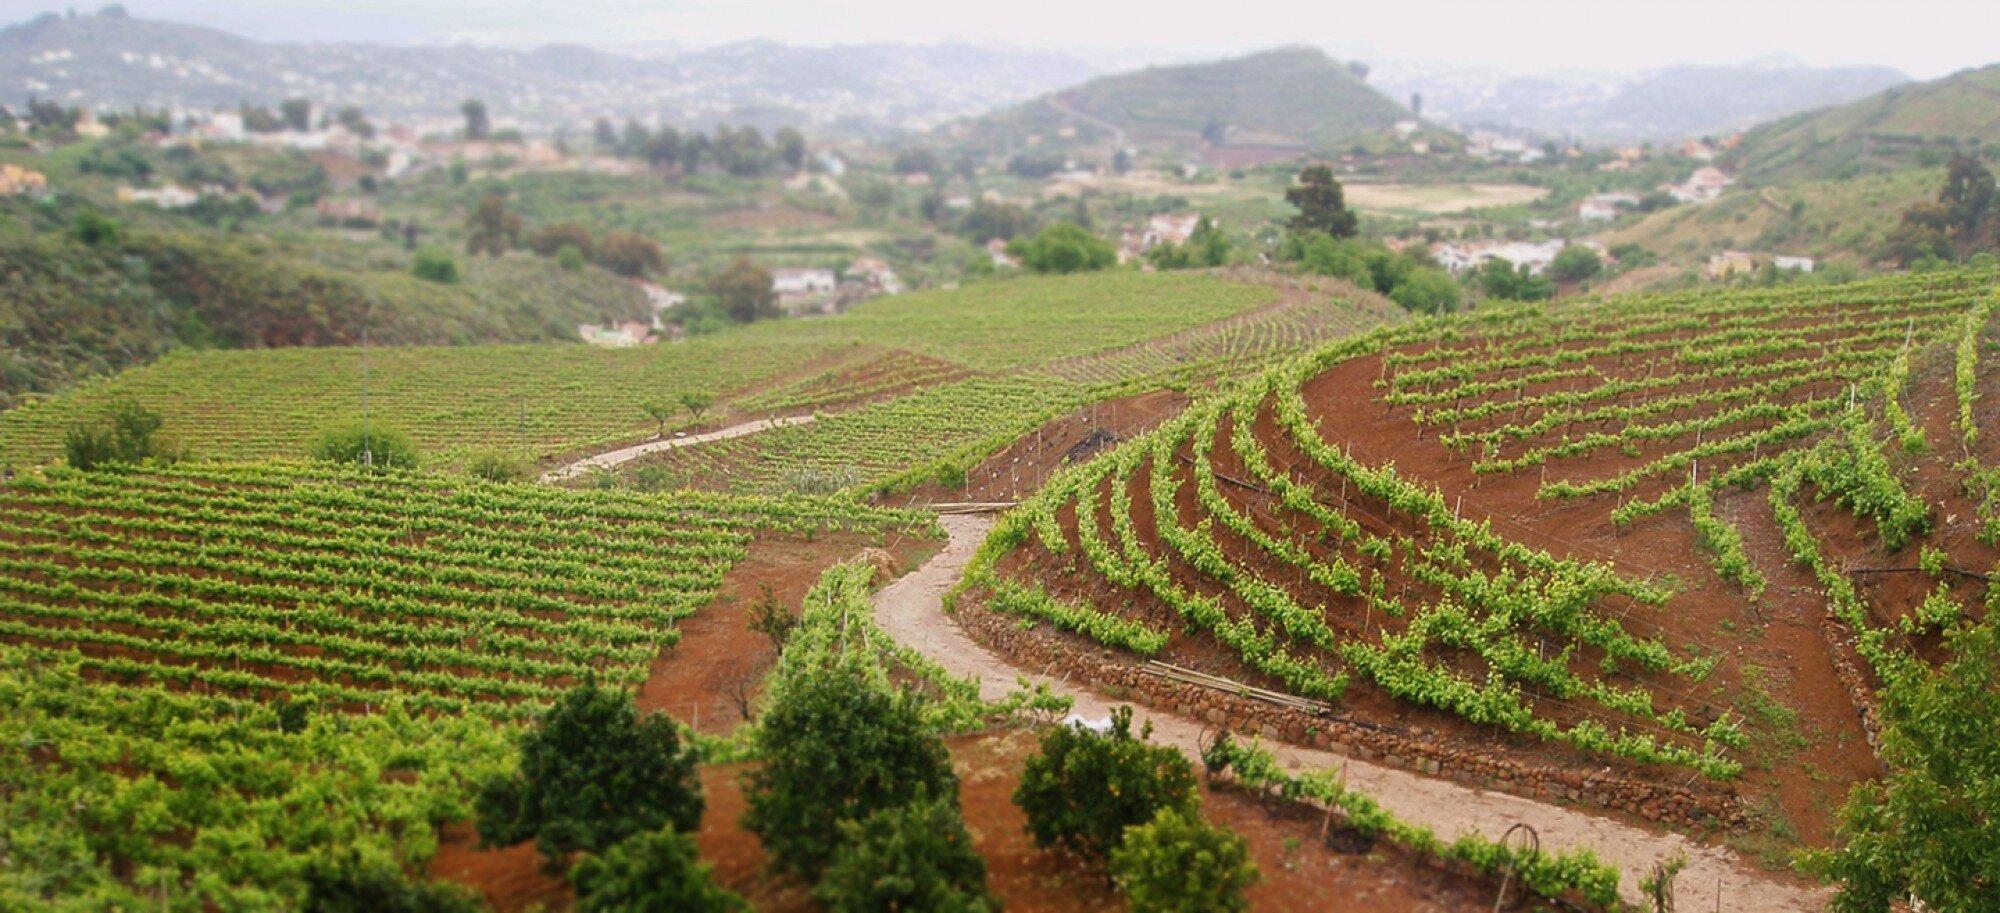 Where the grapes for the Fronton de Oro Rosado come from!